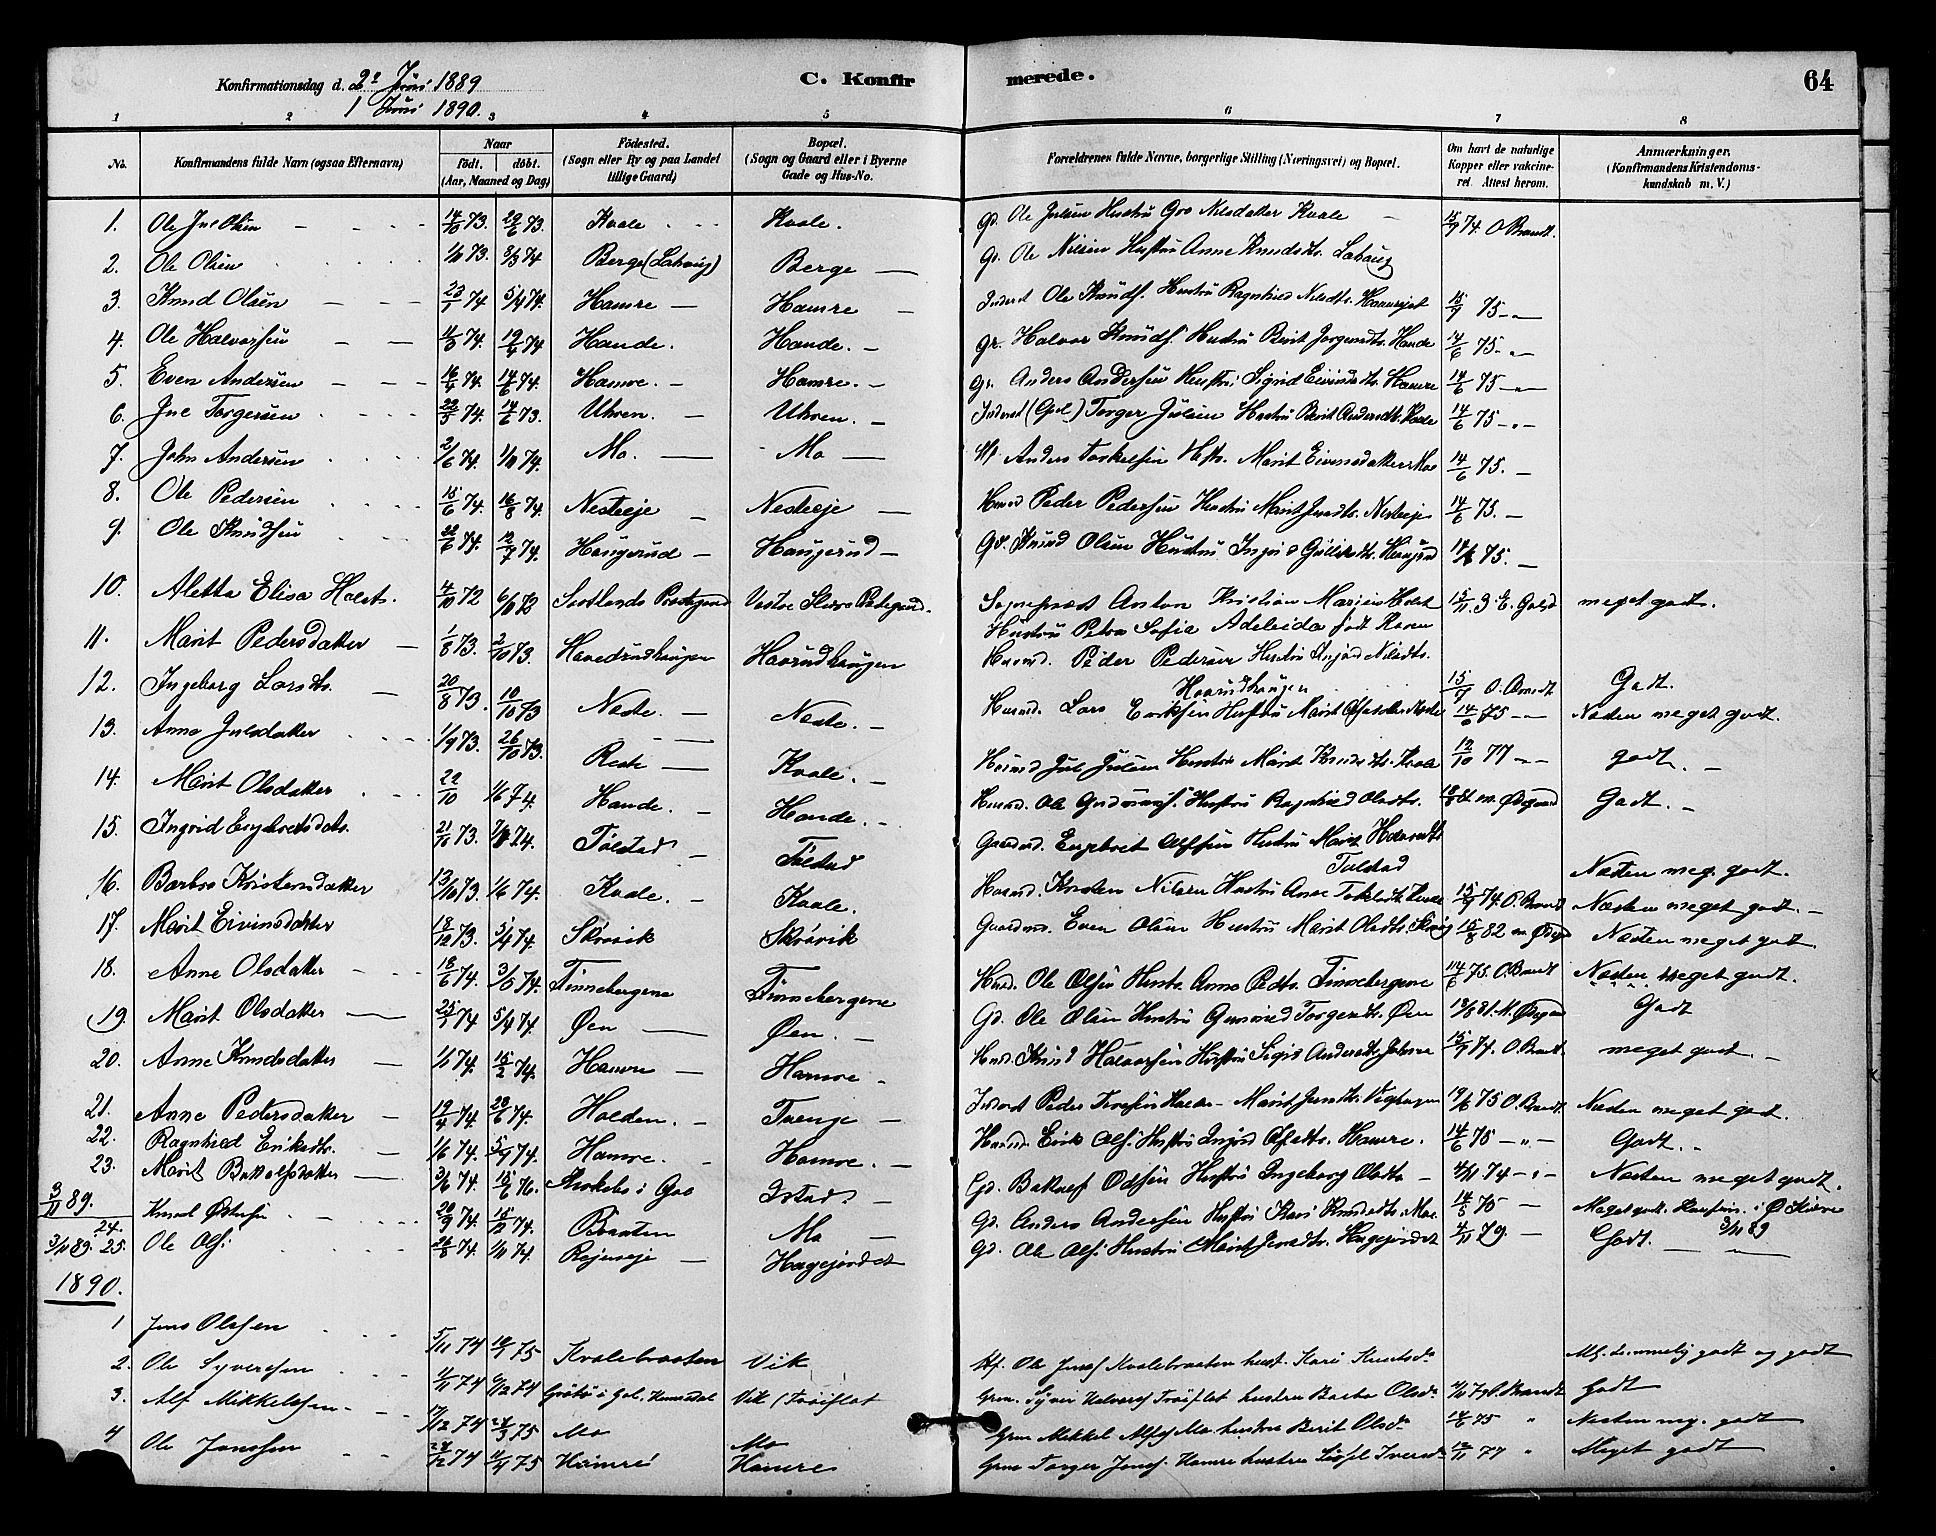 SAH, Vestre Slidre prestekontor, Klokkerbok nr. 4, 1881-1912, s. 64